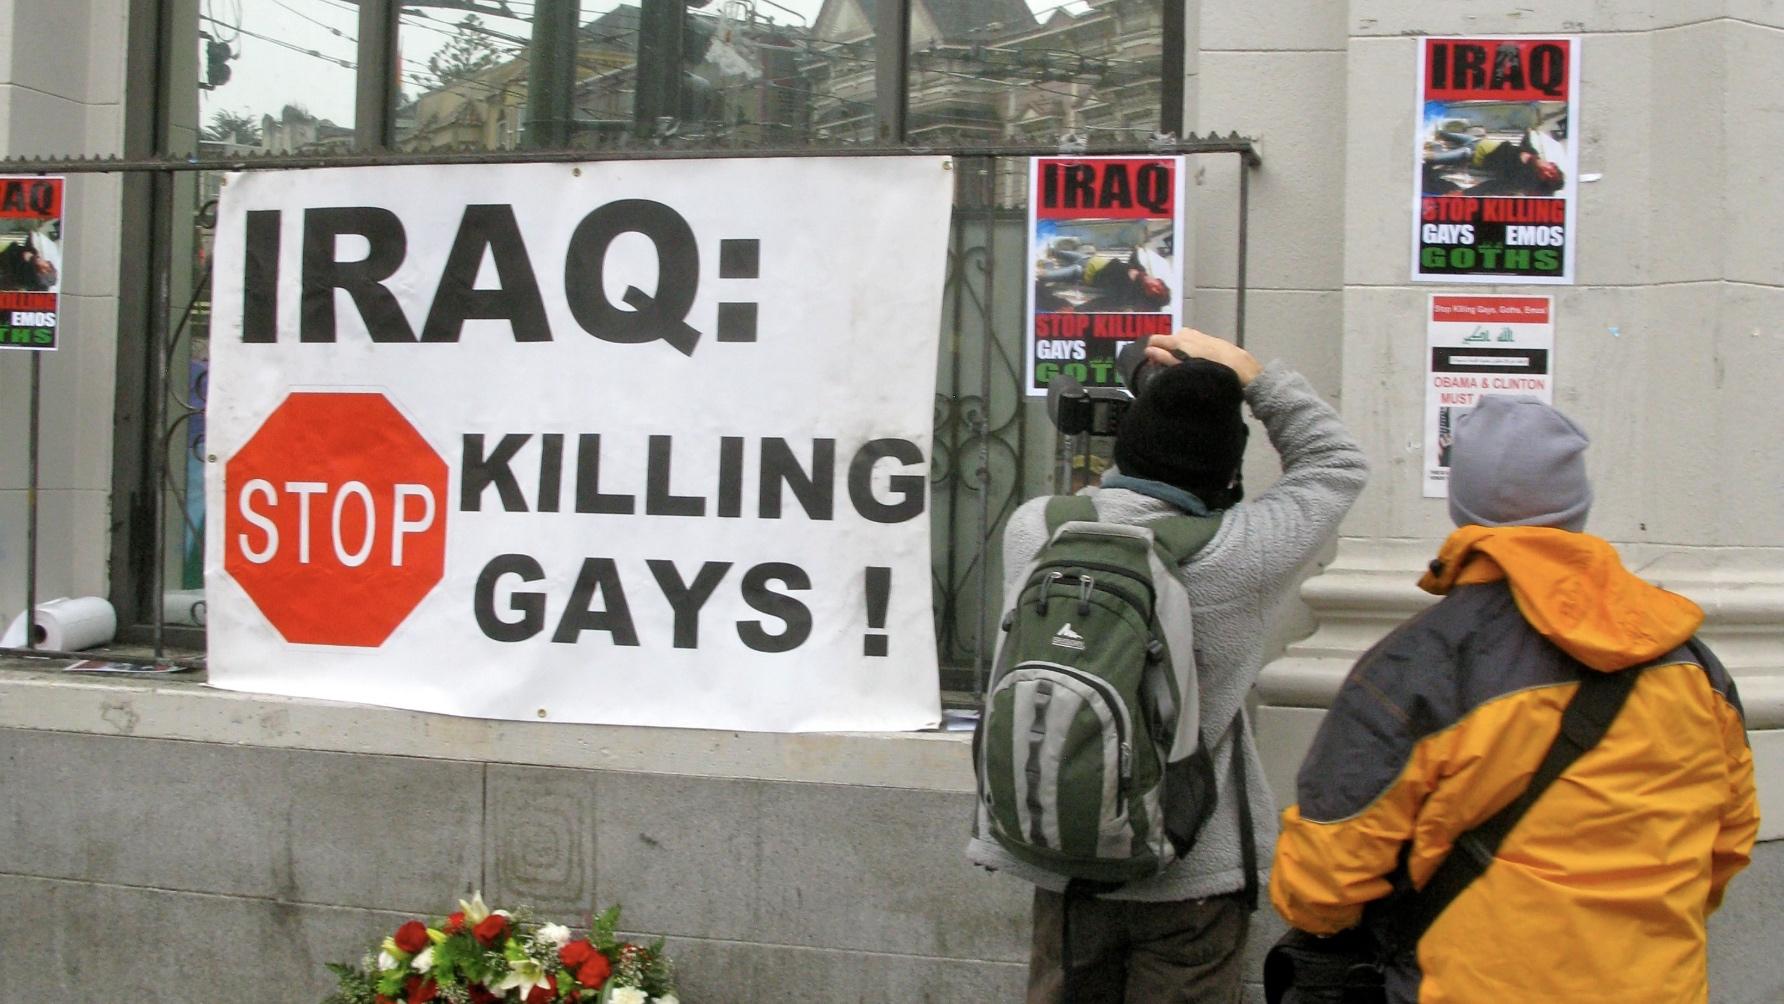 gay iraqi iraqueer 2